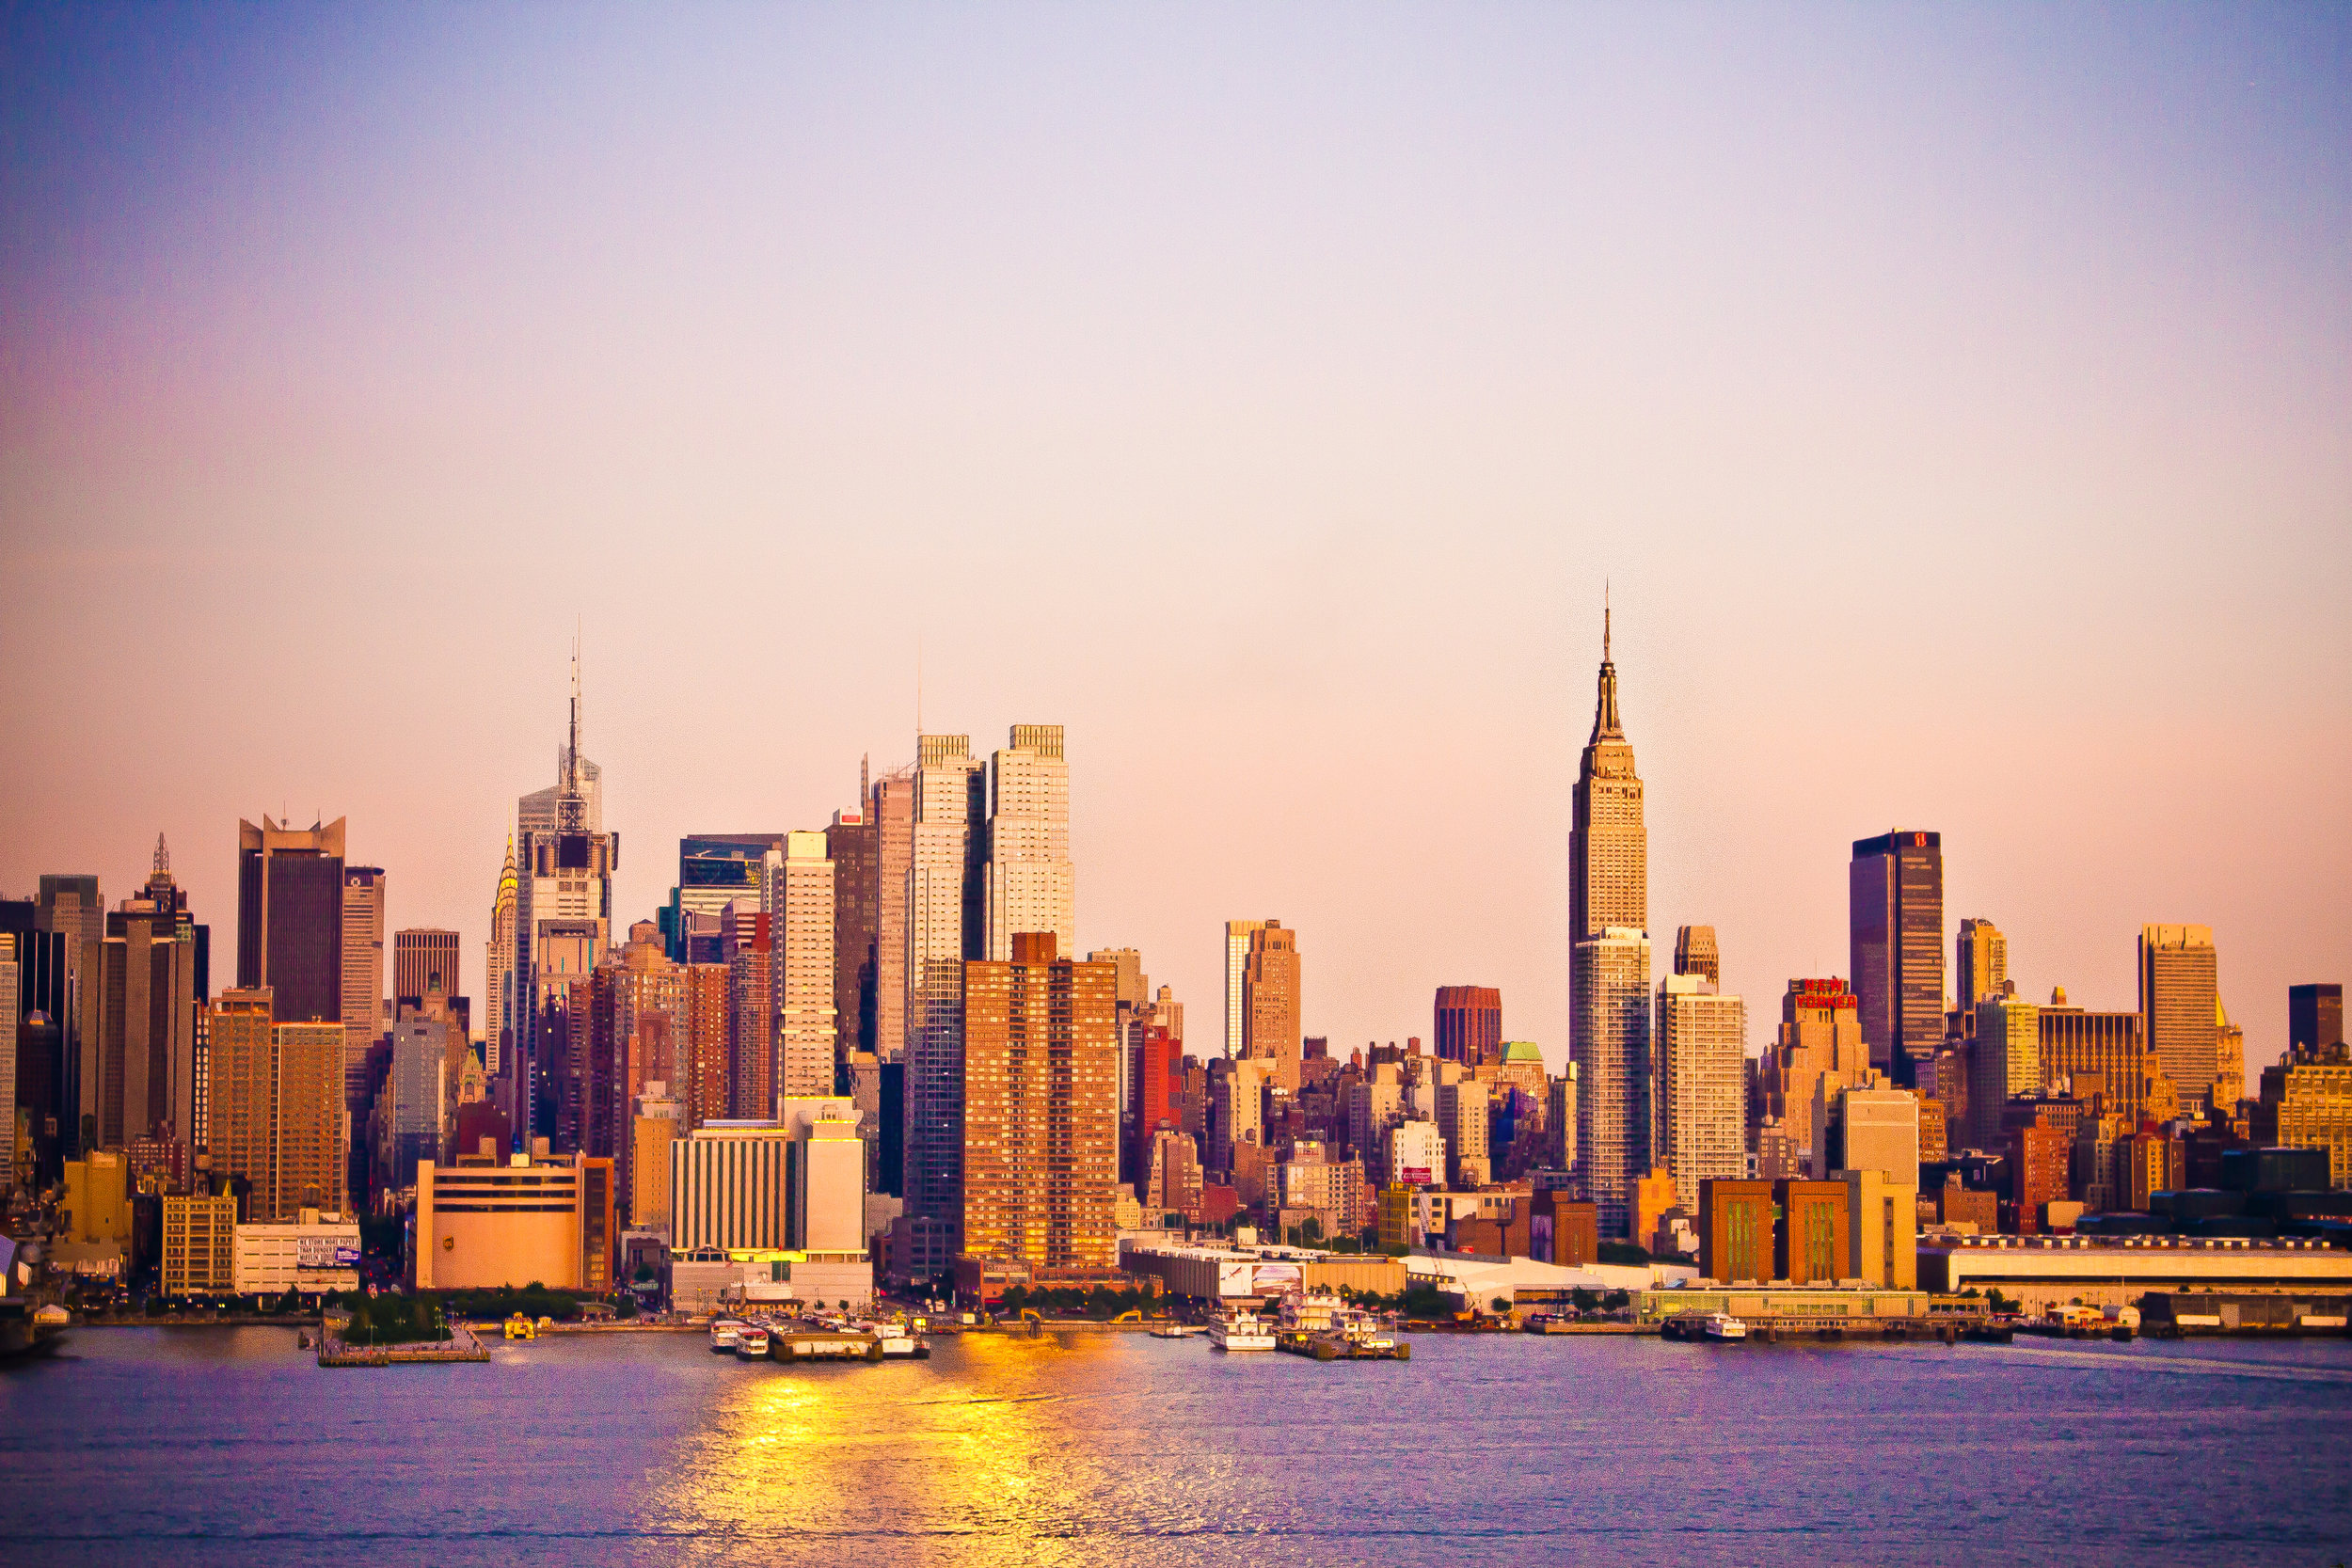 NYC SKYLINE UPDATED.jpg